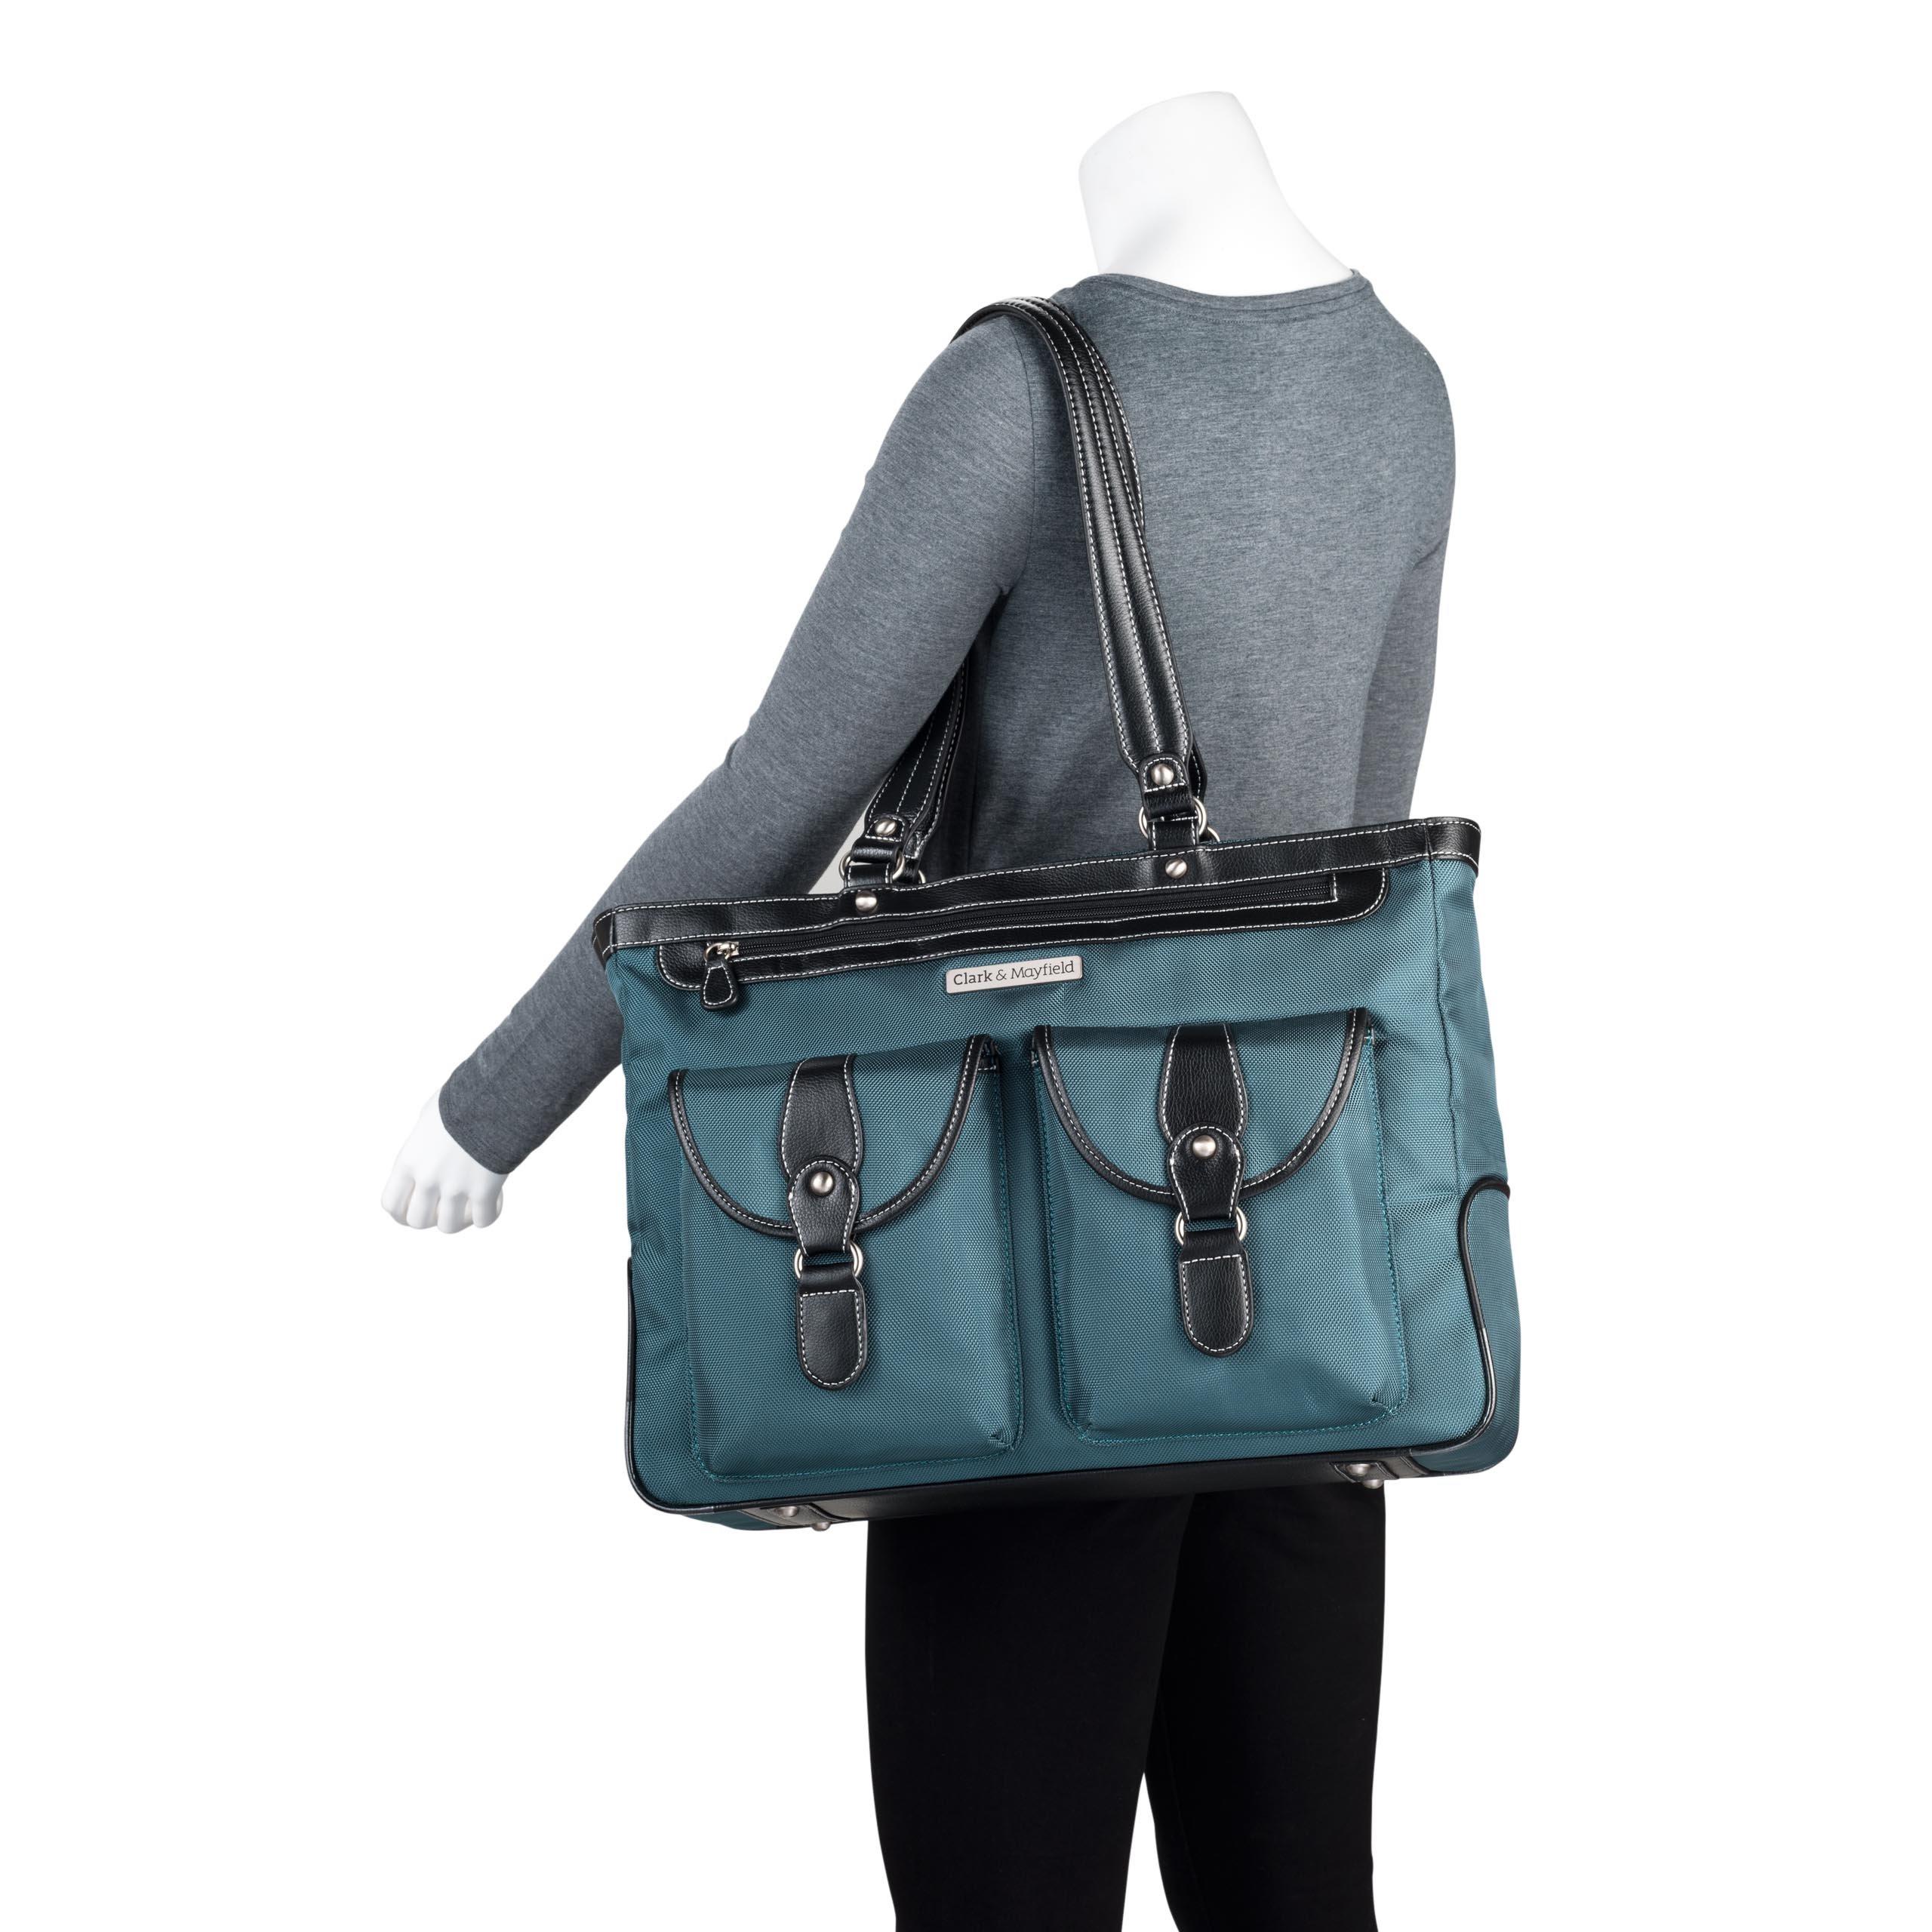 Clark & Mayfield Marquam Laptop Handbag 18.4'' (Deep Teal) by Clark & Mayfield (Image #4)